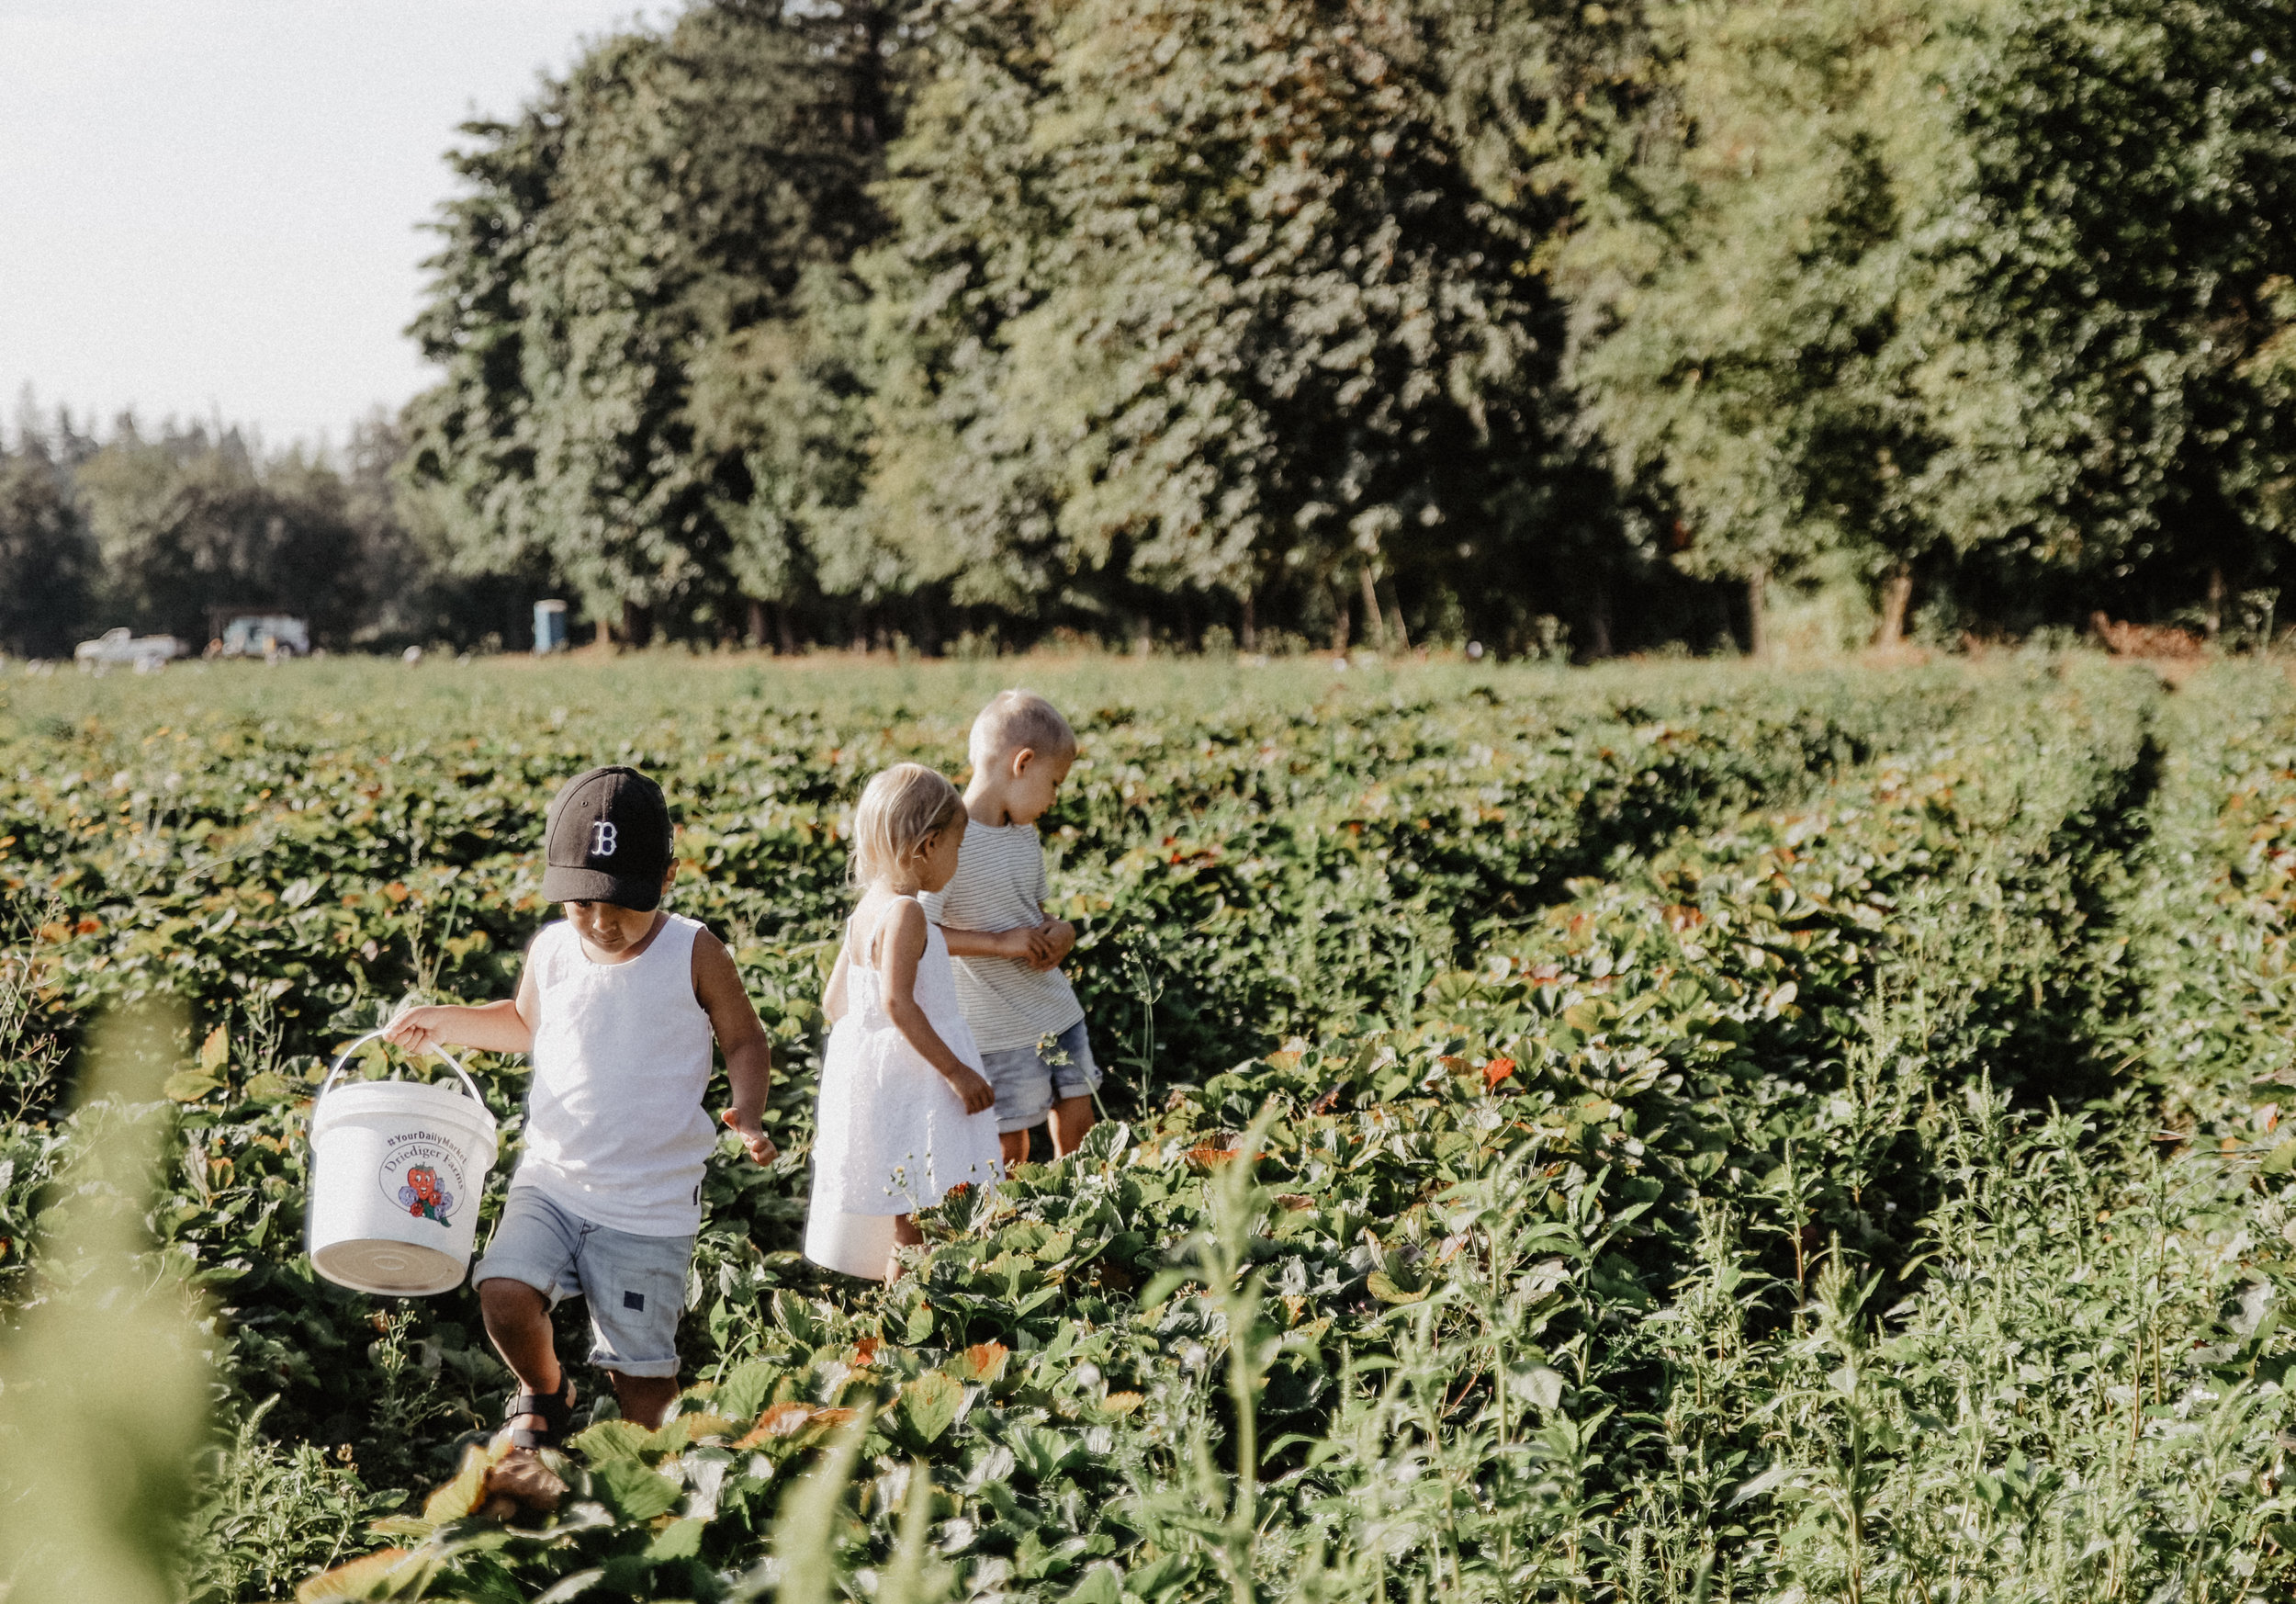 Driediger farms-5.jpg